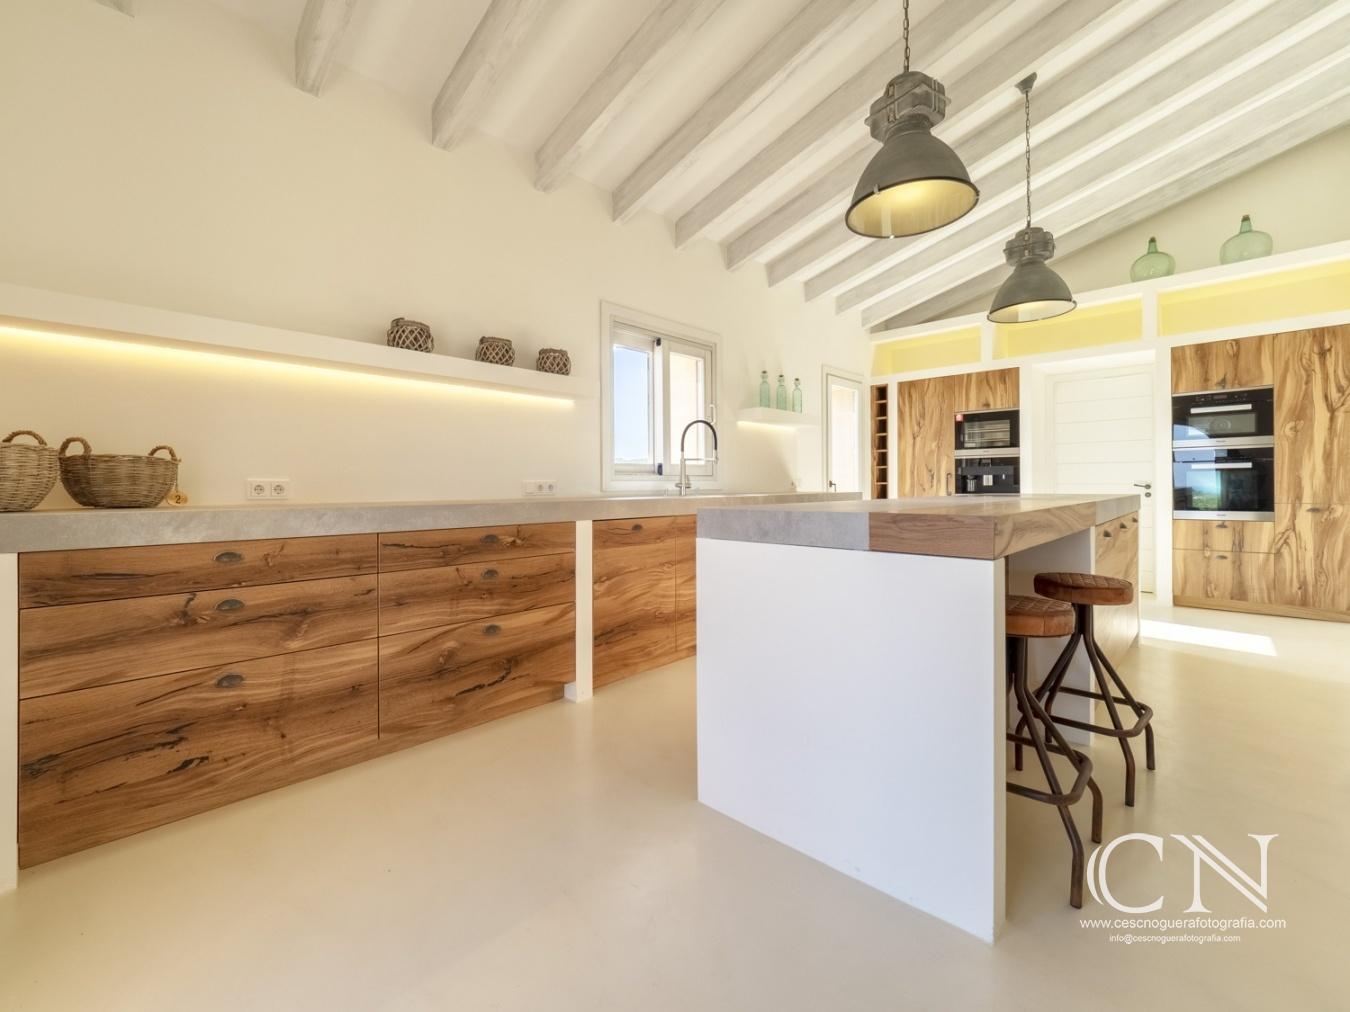 Finca a Santanyi - Cesc Noguera Fotografía, Architectural & Interior design photographer / Landscape Photography